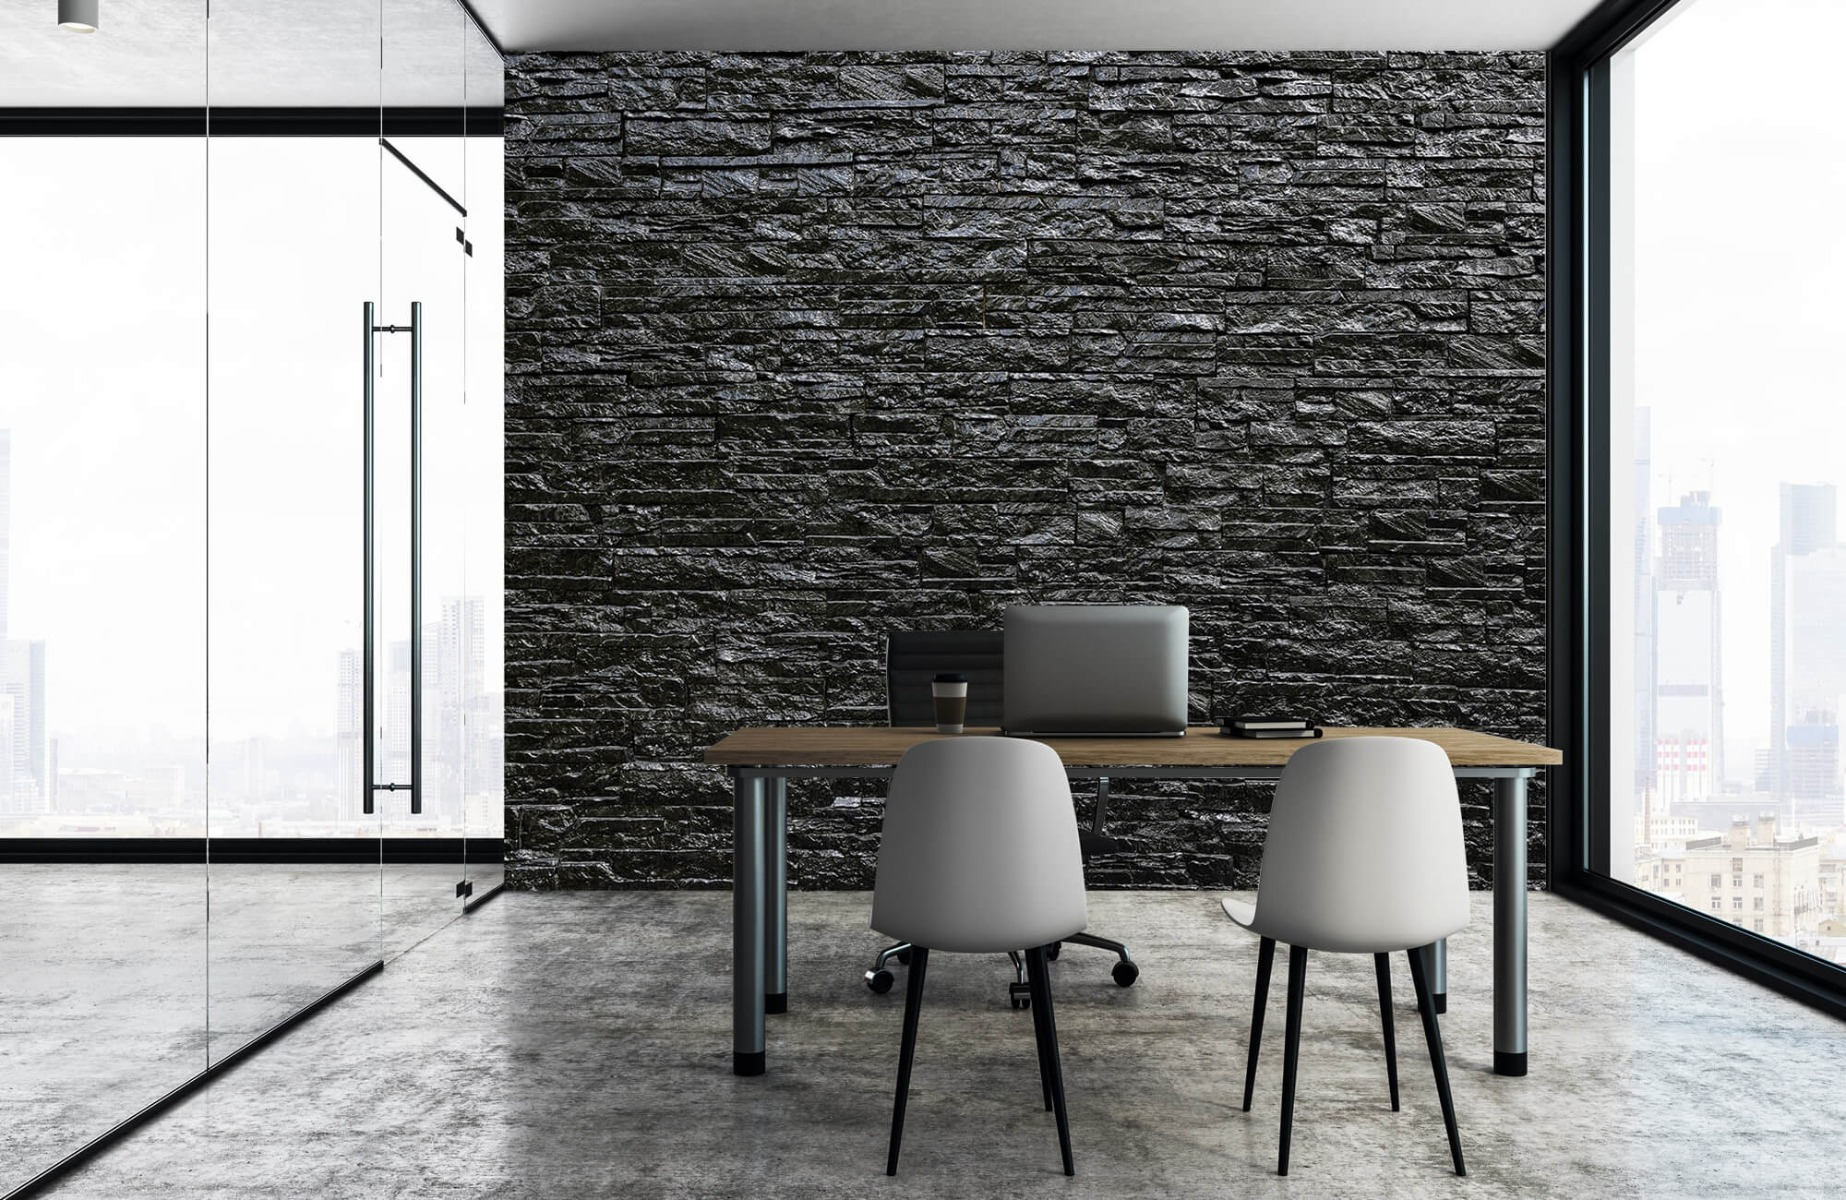 Steen behang - Zwarte stenen - Slaapkamer 4